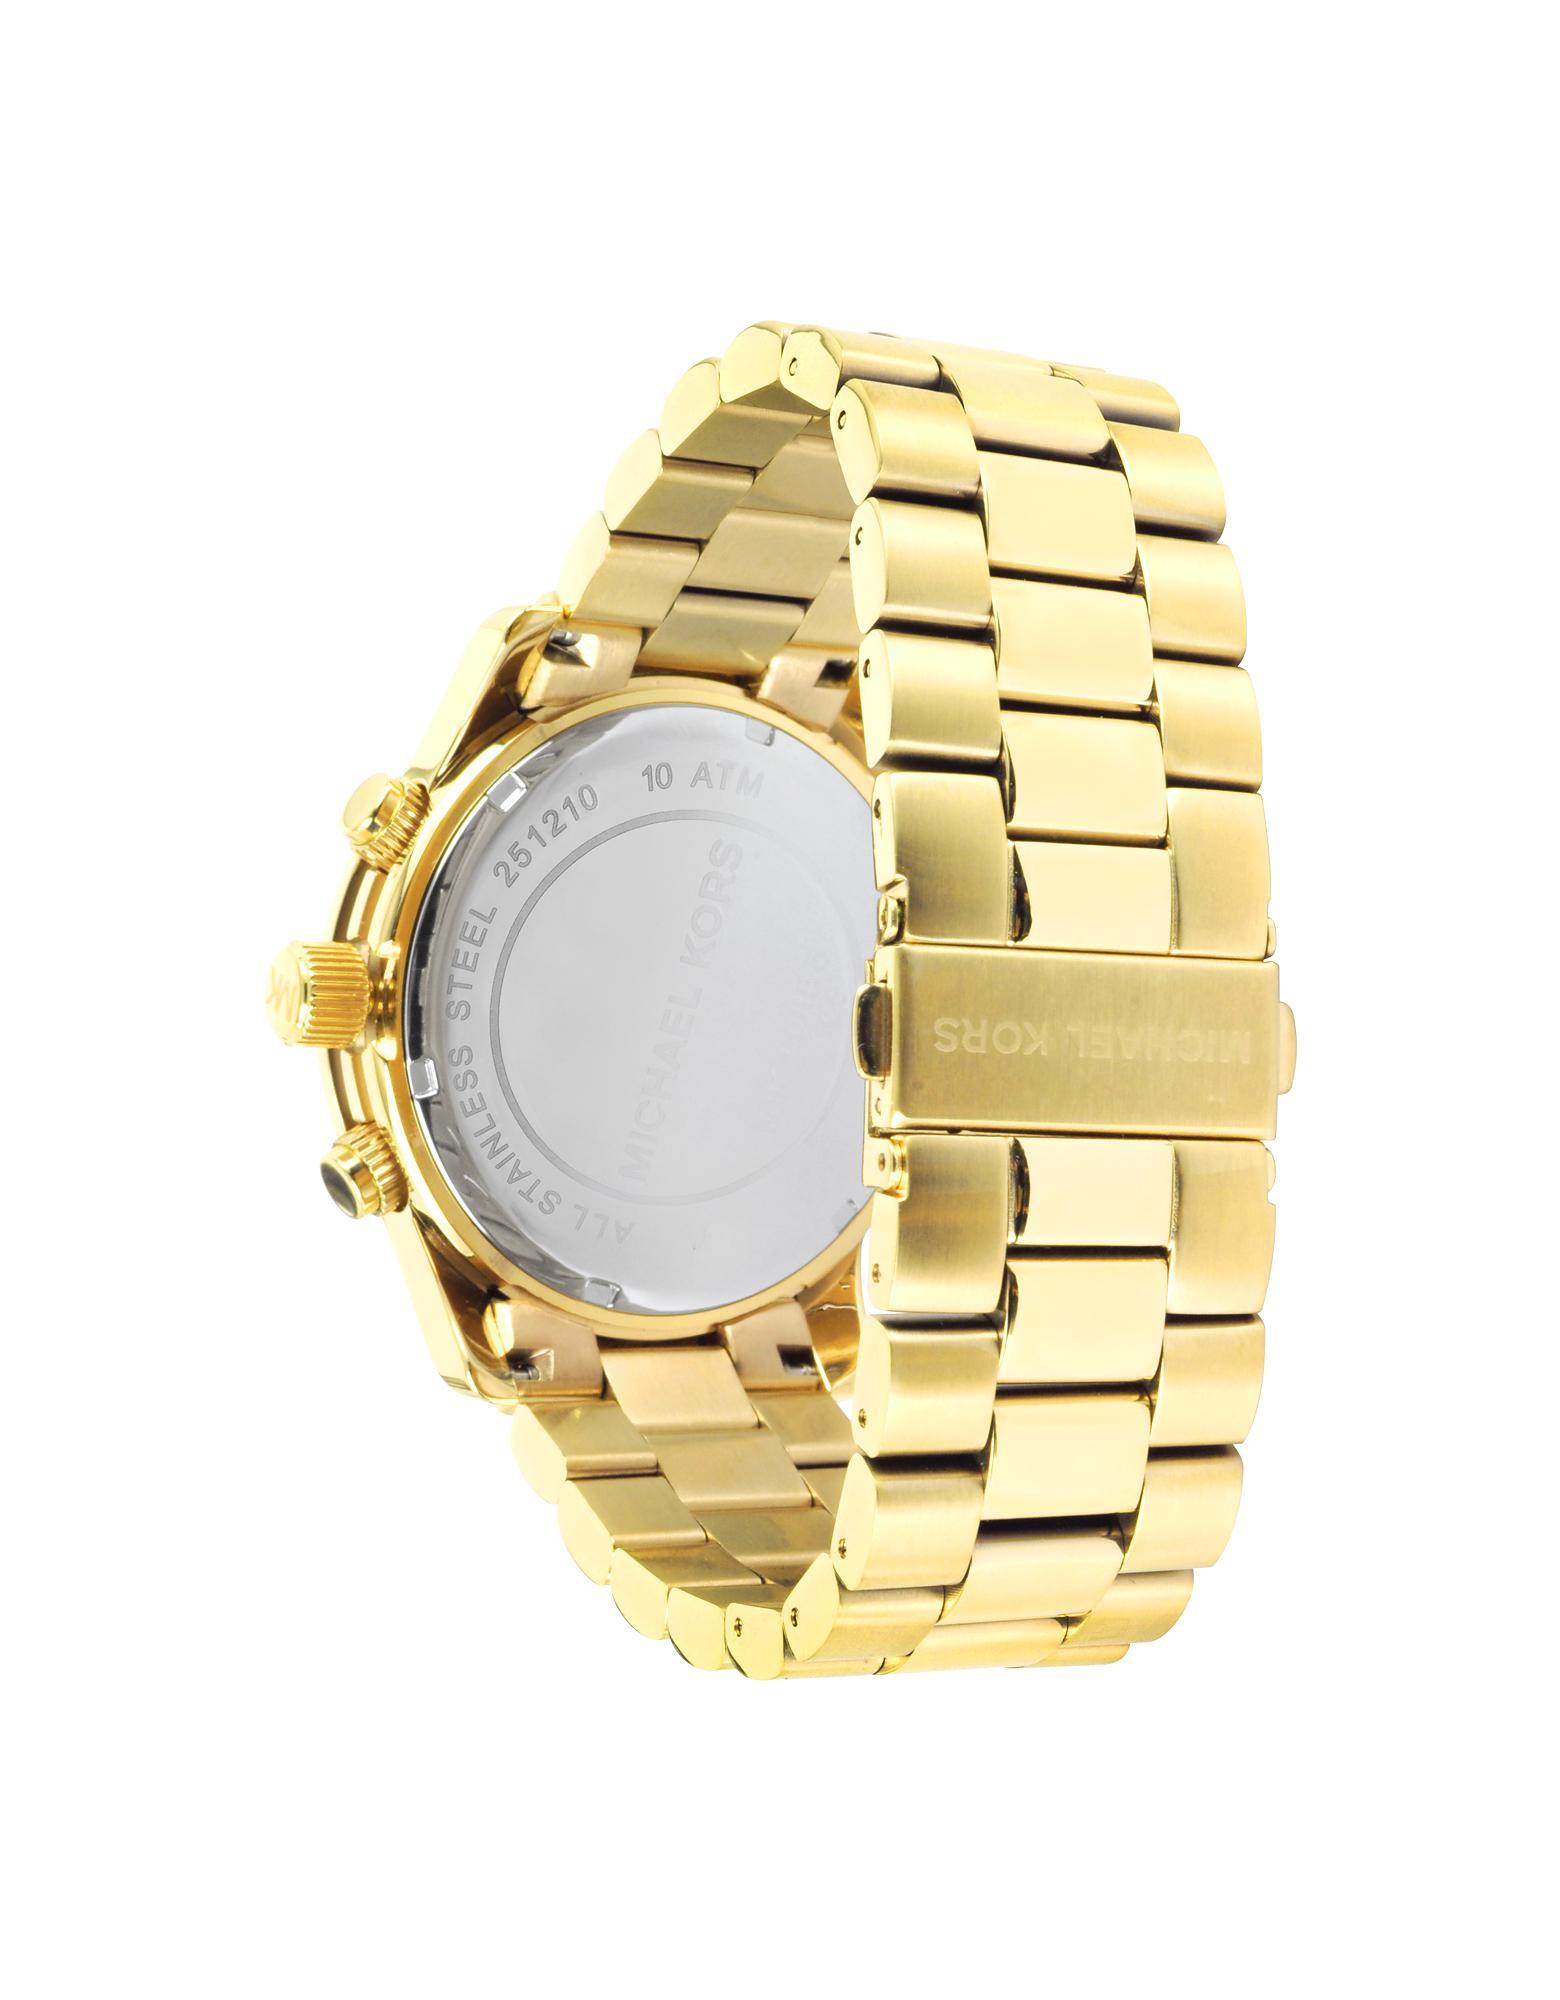 Lyst Michael Kors Men S Runway Gold Tone Stainless Steel Bracelet Watch In Metallic For